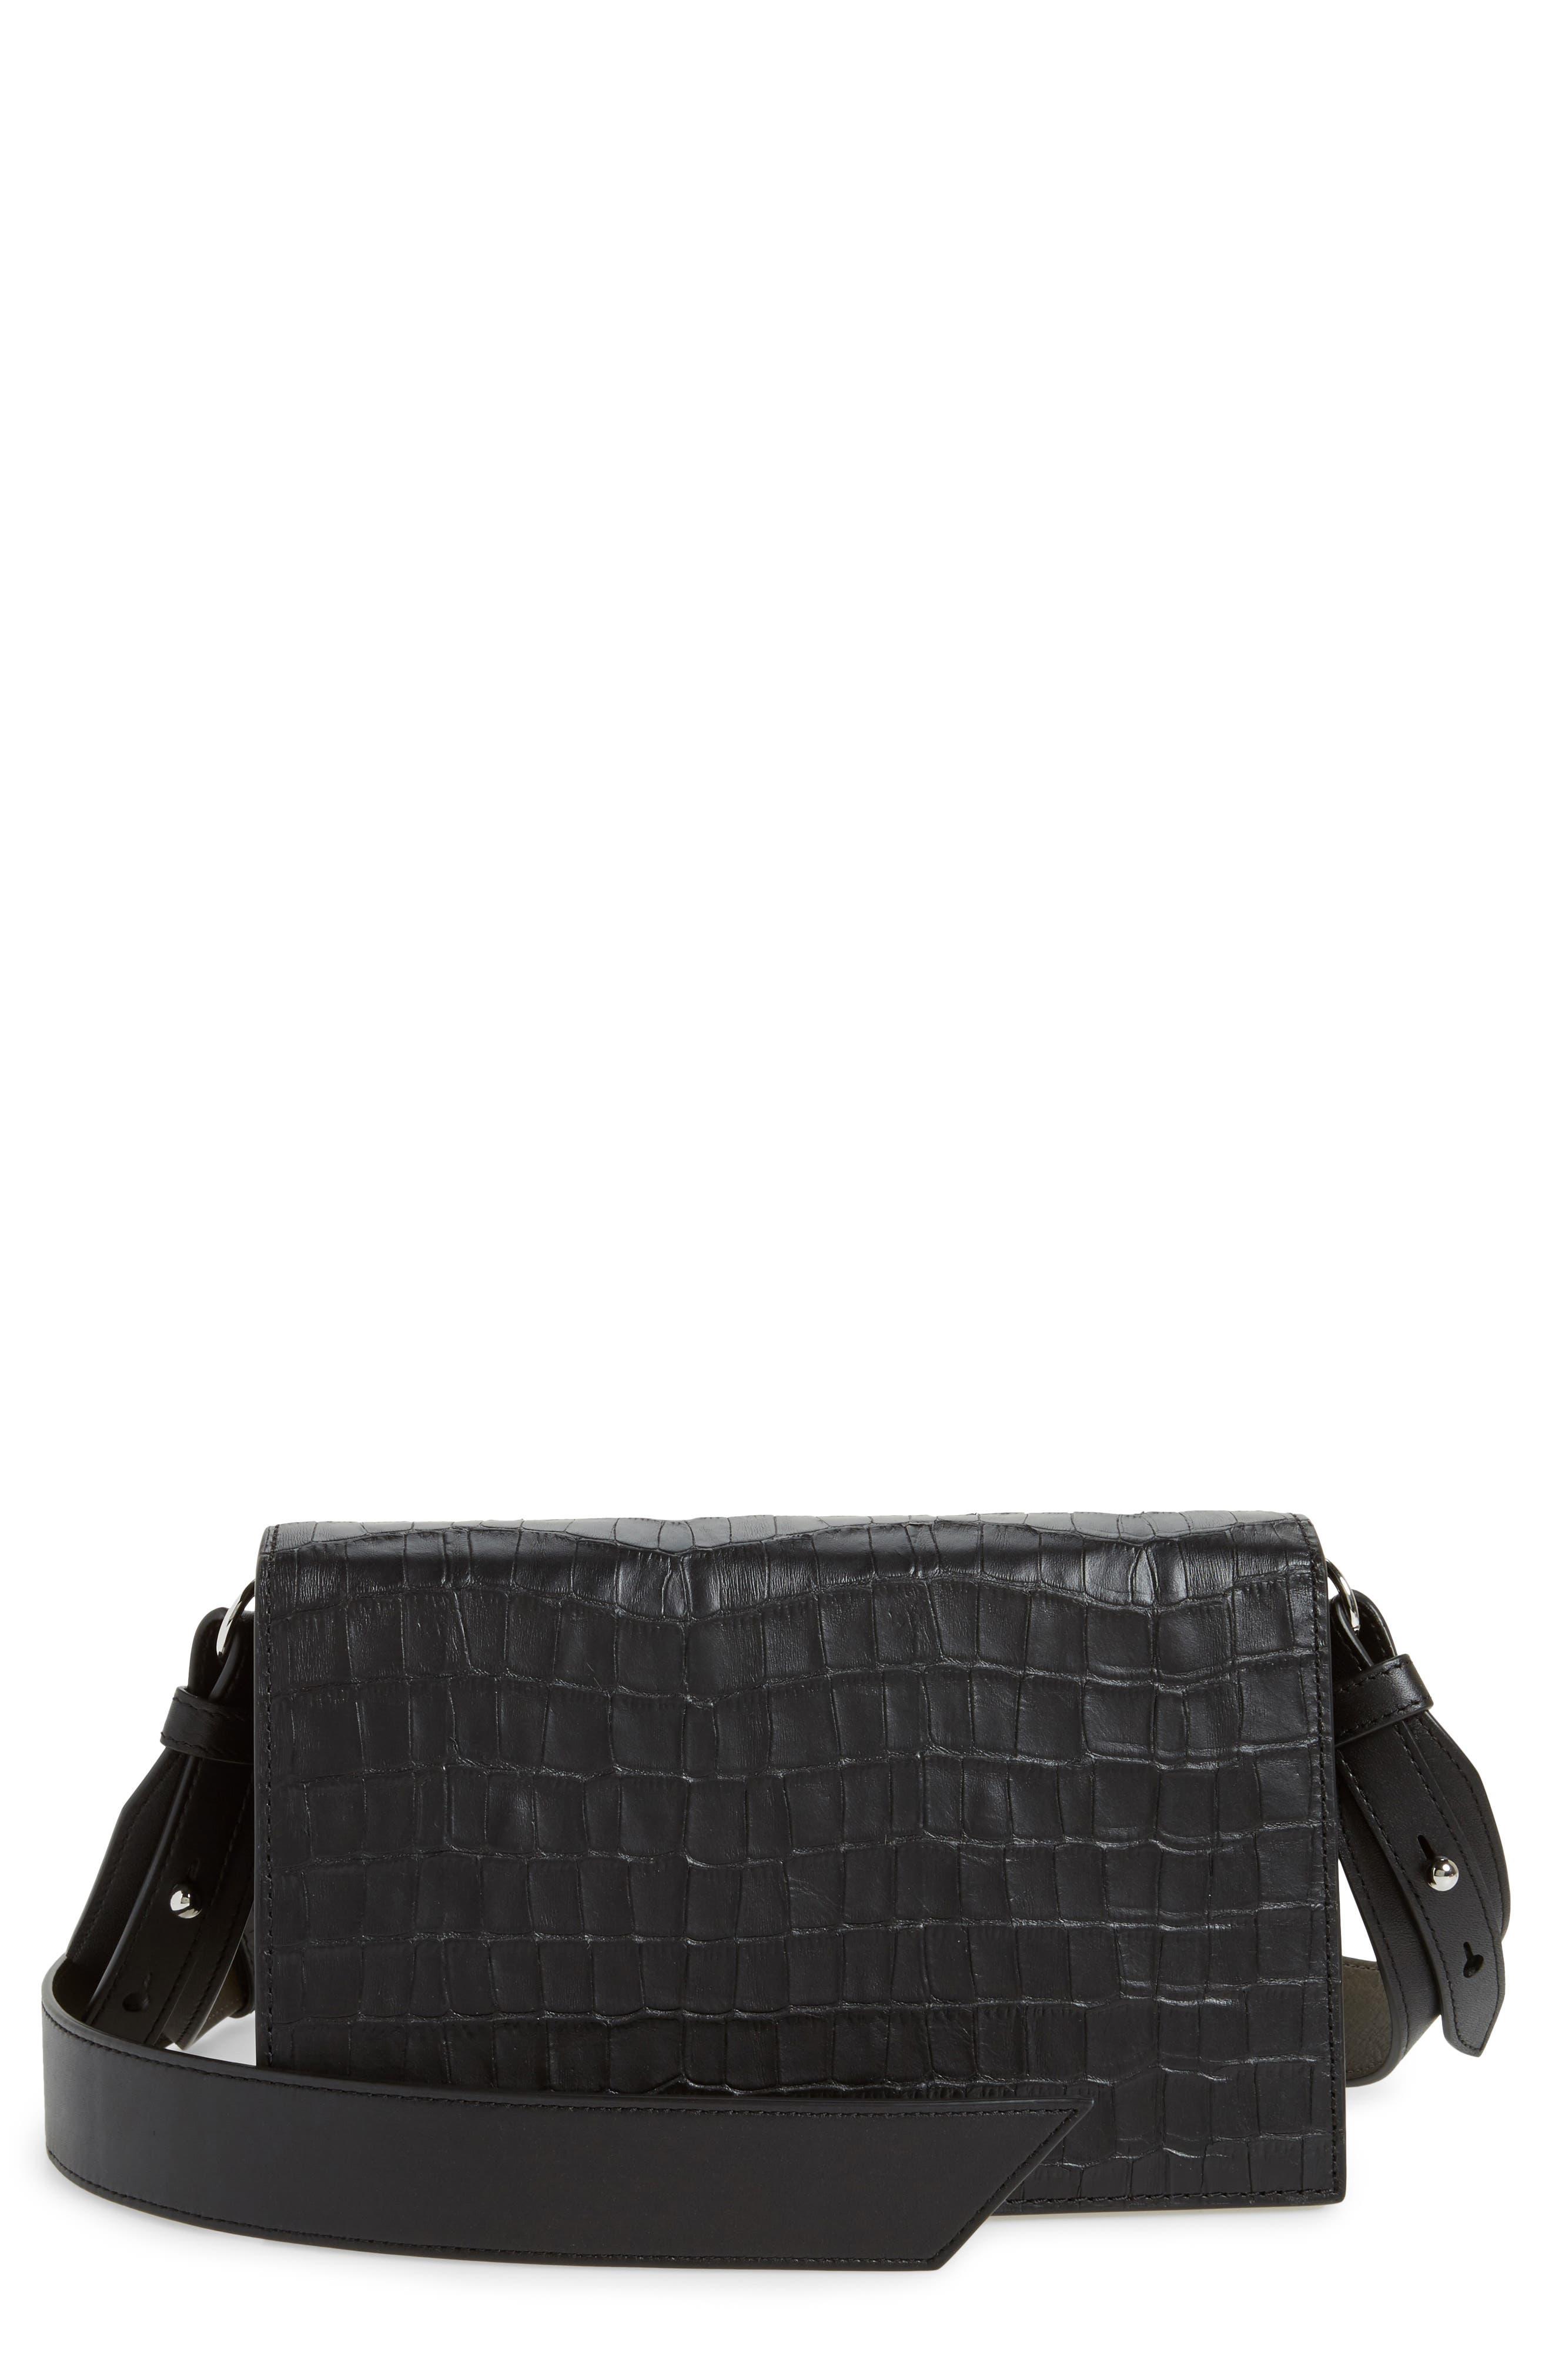 Main Image - ALLSAINTS Keel Croc Embossed Leather Box Bag